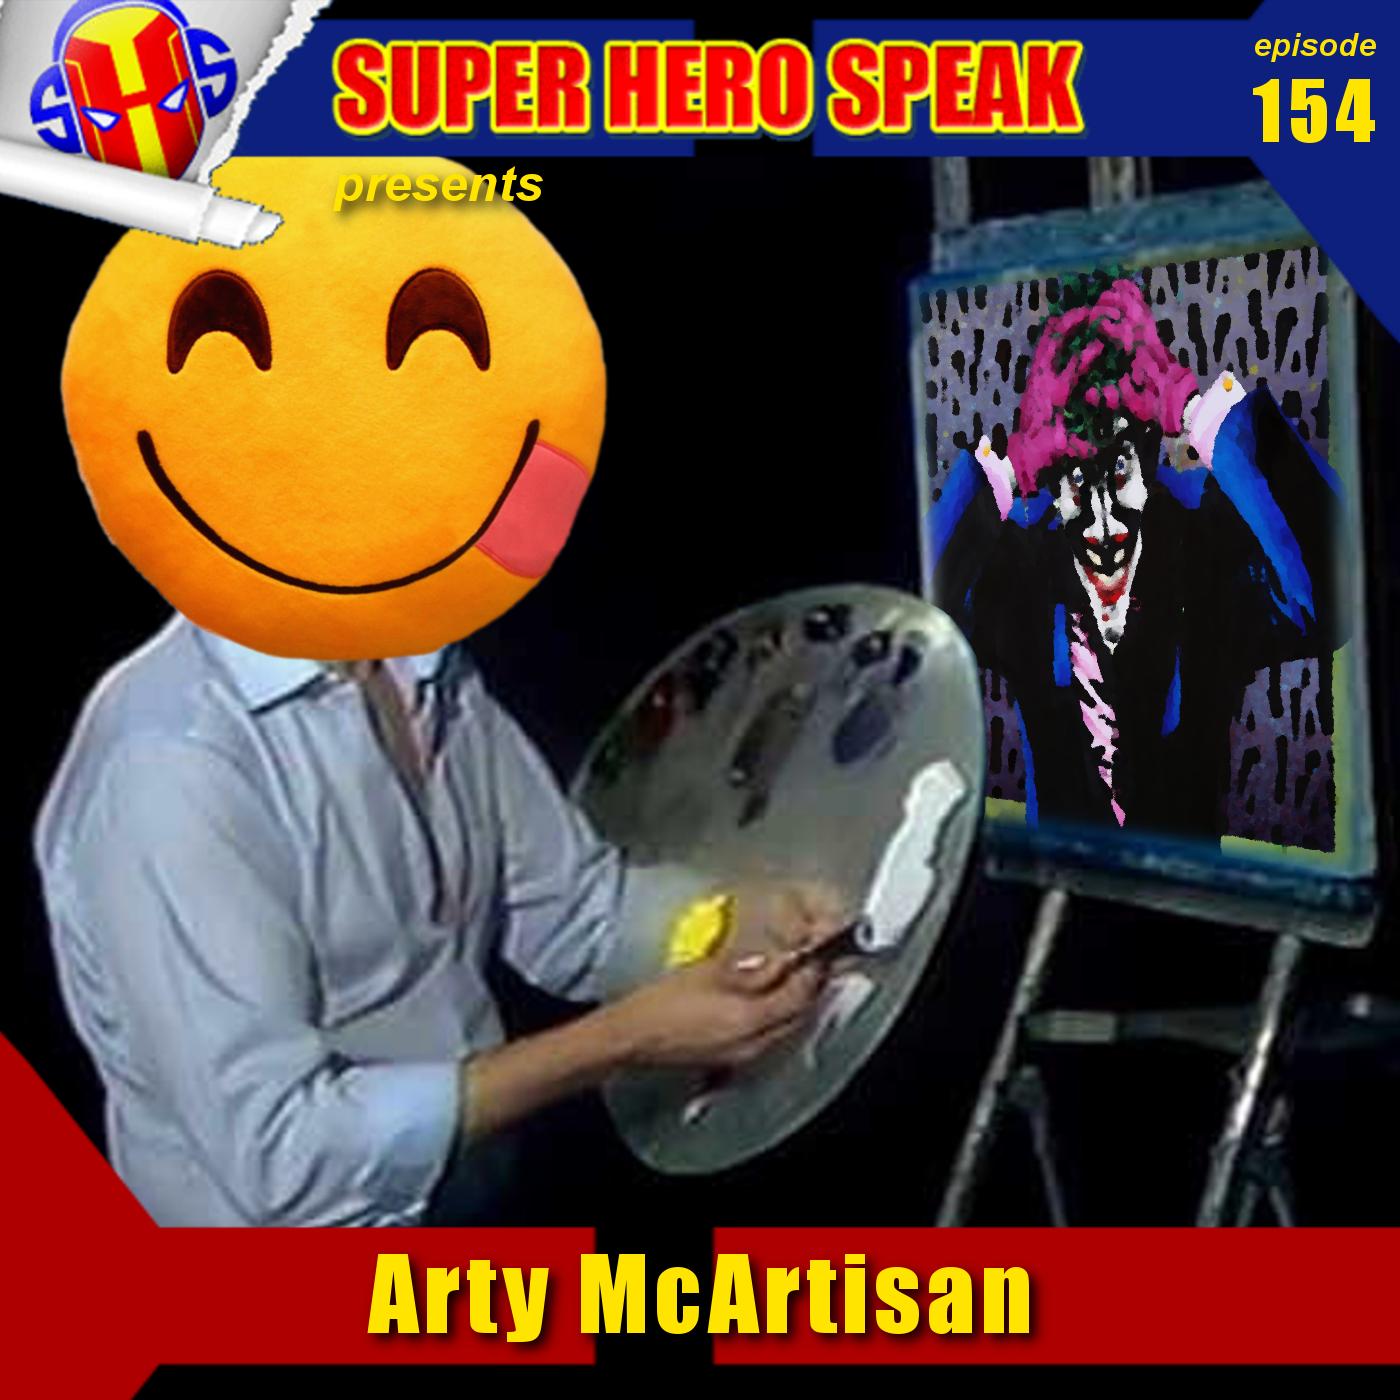 #154: Arty McArtisan